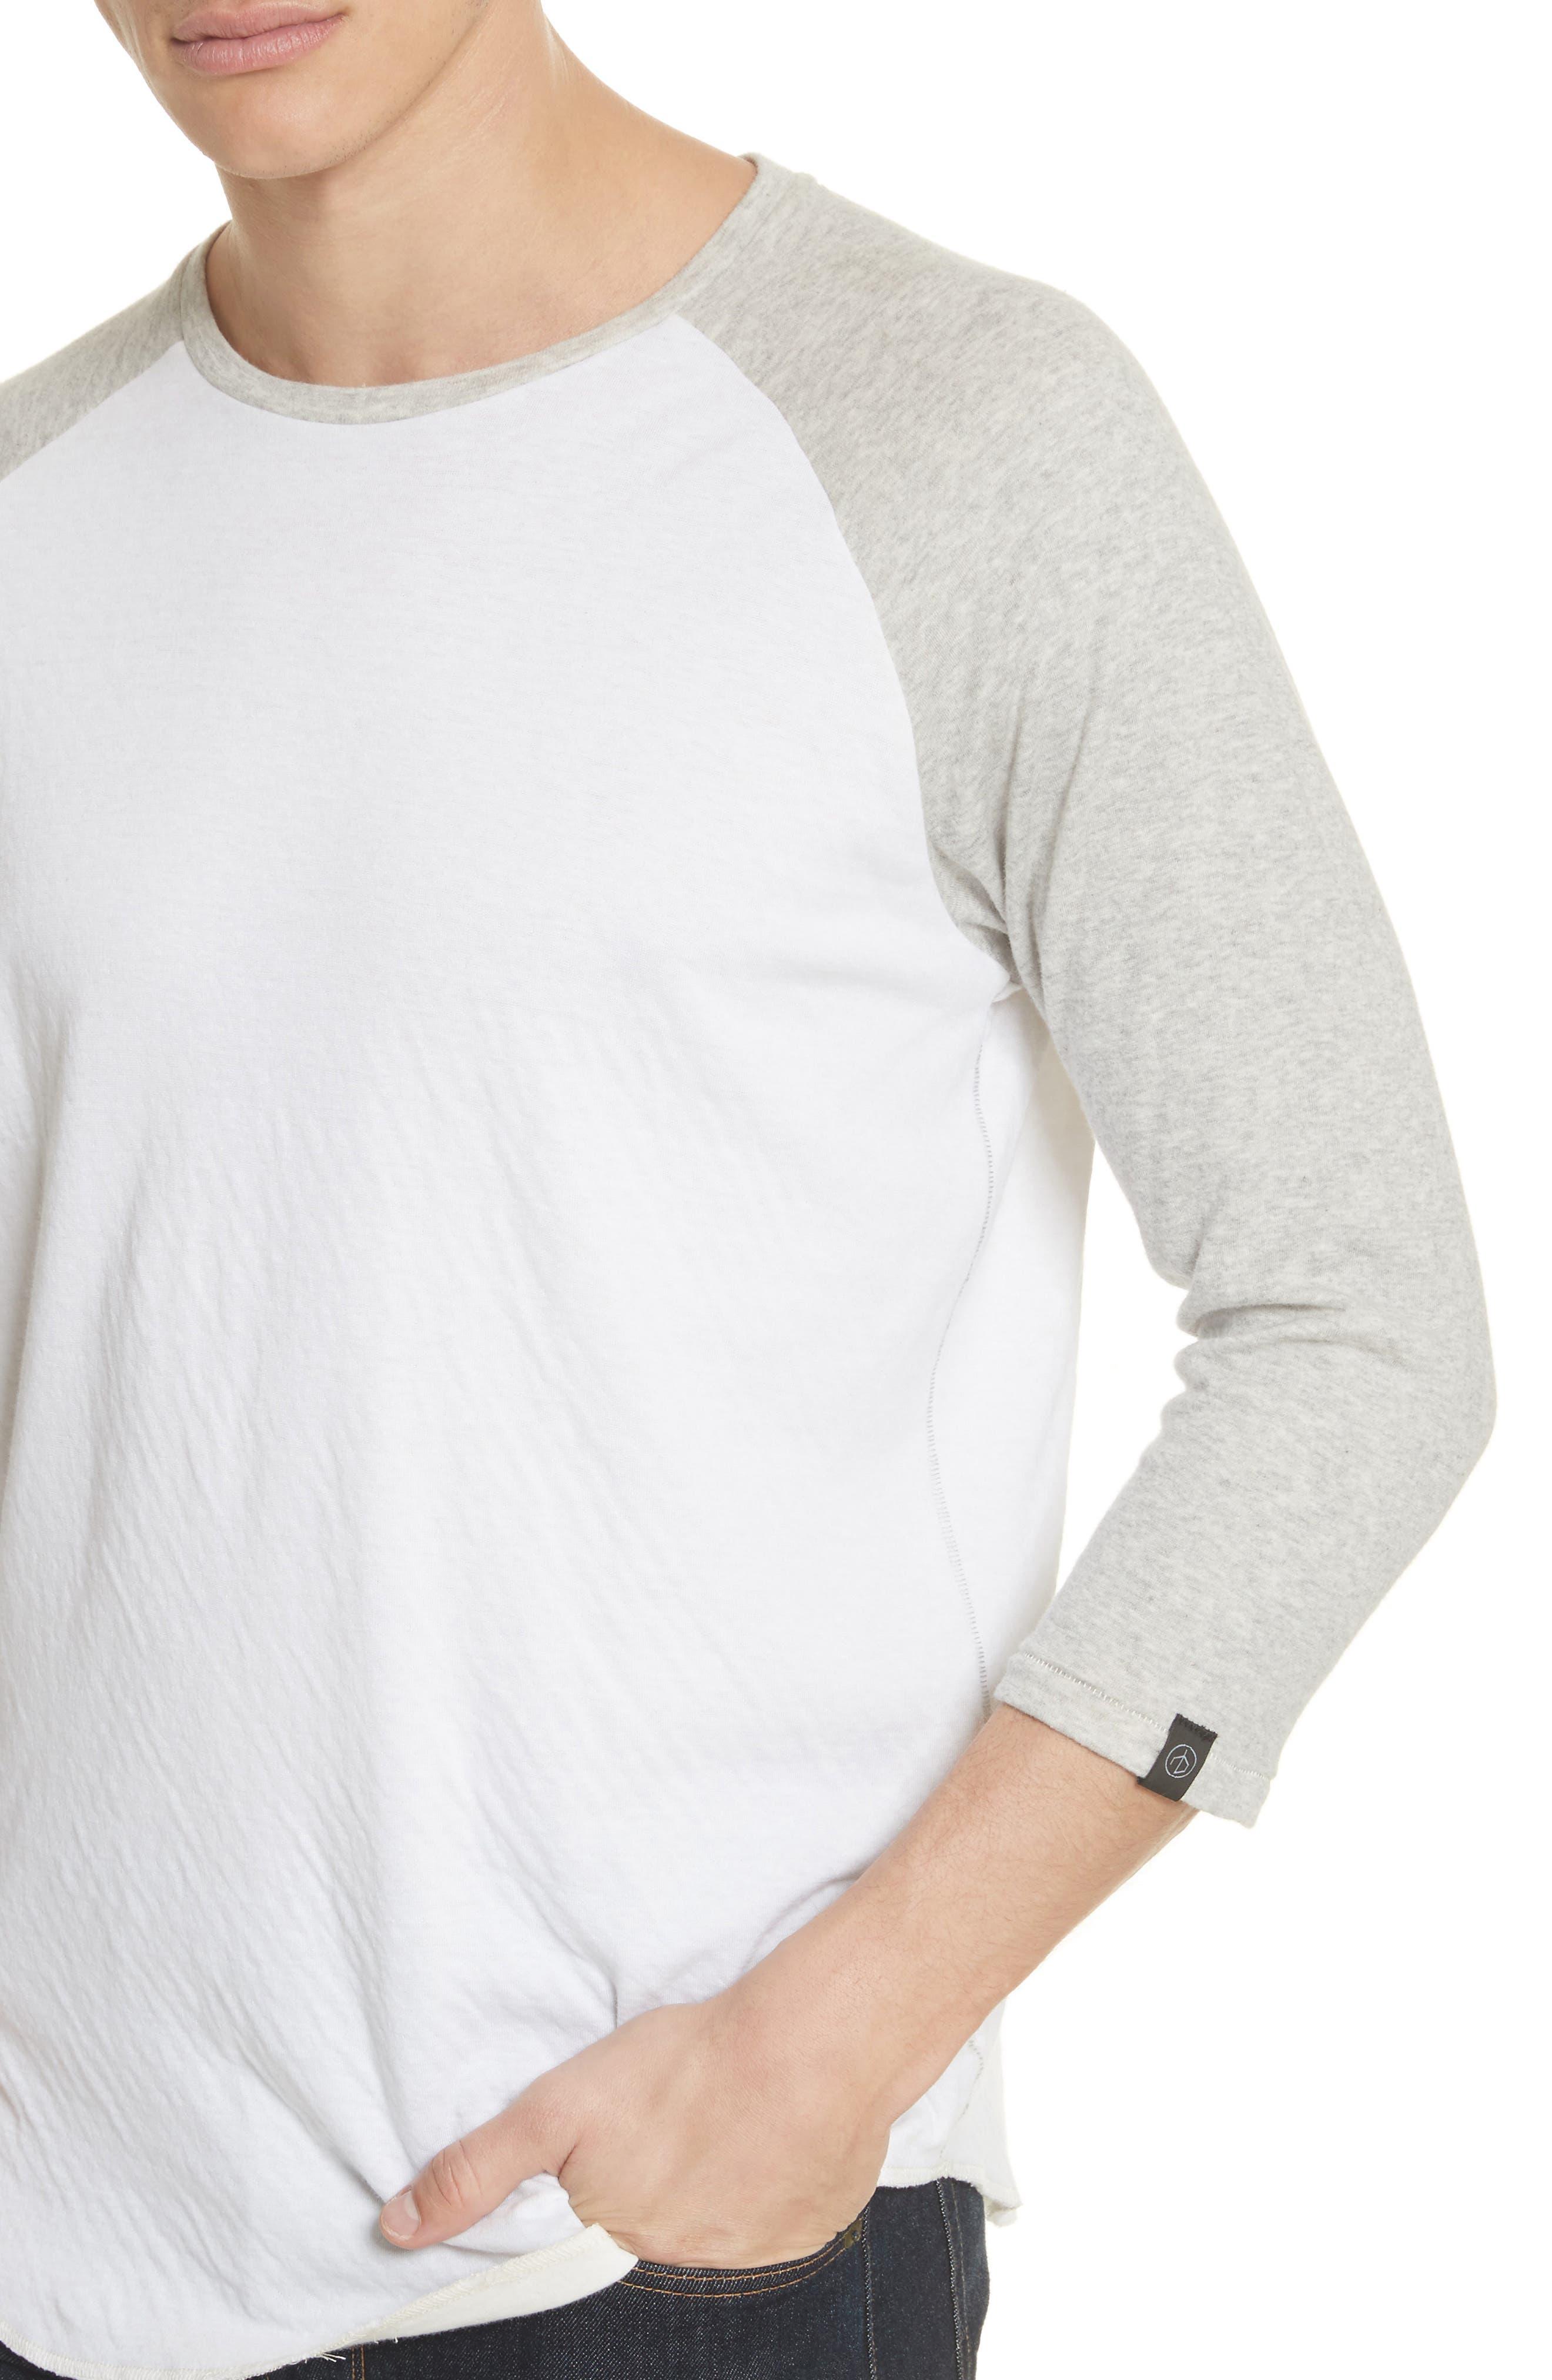 Rigby Baseball T-Shirt,                             Alternate thumbnail 4, color,                             Grey/ White